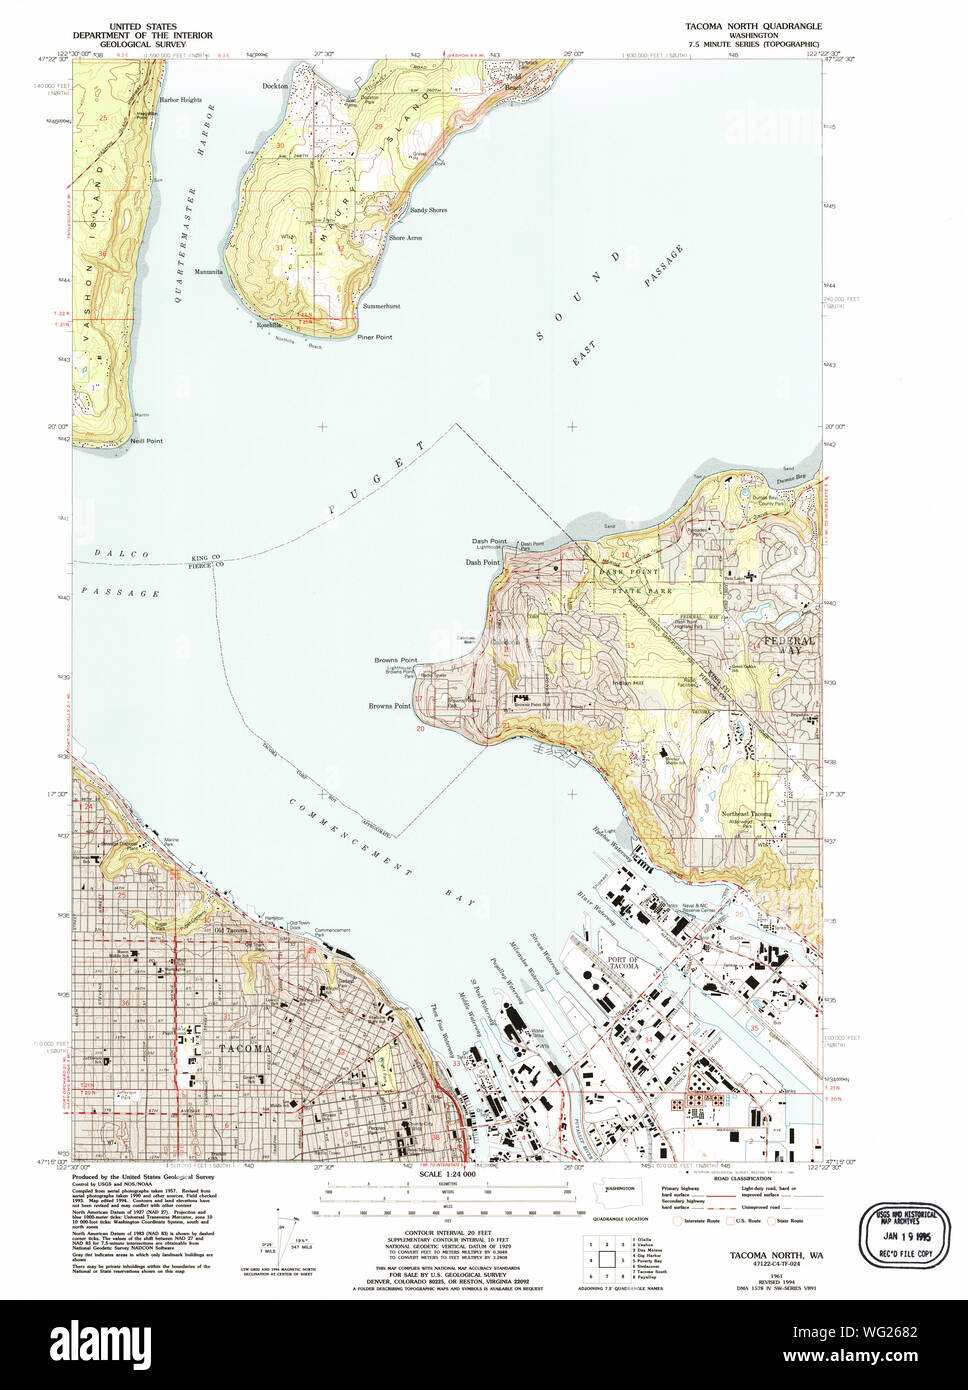 USGS Topo Map Washington State WA Tacoma North 244157 1961 ... Map Of Washington Tacoma Area on map tacoma wash, map of tacoma washington 98404, map of neighborhoods tacoma wa, map of tacoma and surrounding cities, map of washington virginia area, zip code map houston and surrounding area, tacoma dome parking area, map of washington hood canal area, map of north tacoma washington, map of greater seattle tacoma area, map of north end tacoma, map of washington dc area, map of washington seattle area, map of washington state military bases, map of downtown tacoma wa, map tacoma fife, map seattle washington usa, map of washington oregon area, map of washington baltimore area, map of seattle and surrounding cities,